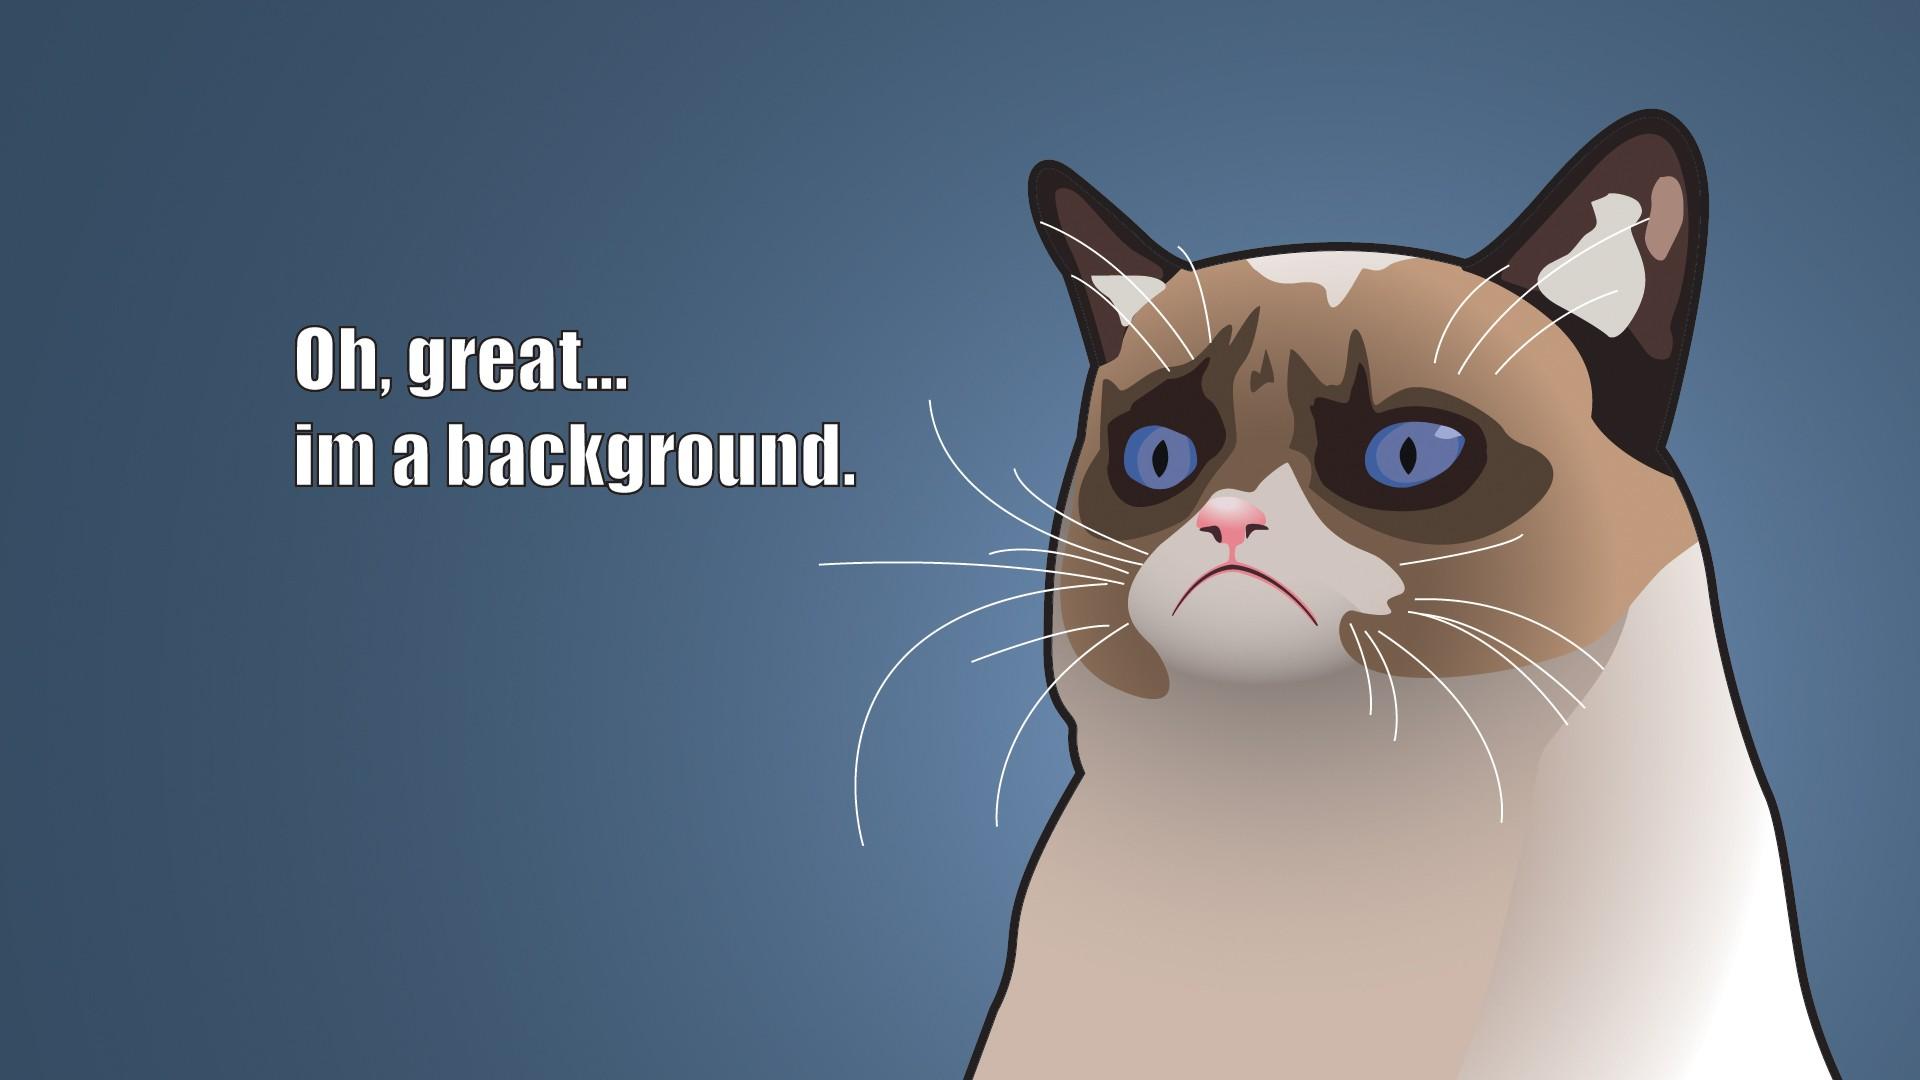 Grumpy Cat Meme Pictures humor funny cats r wallpaper 1920x1080 1920x1080